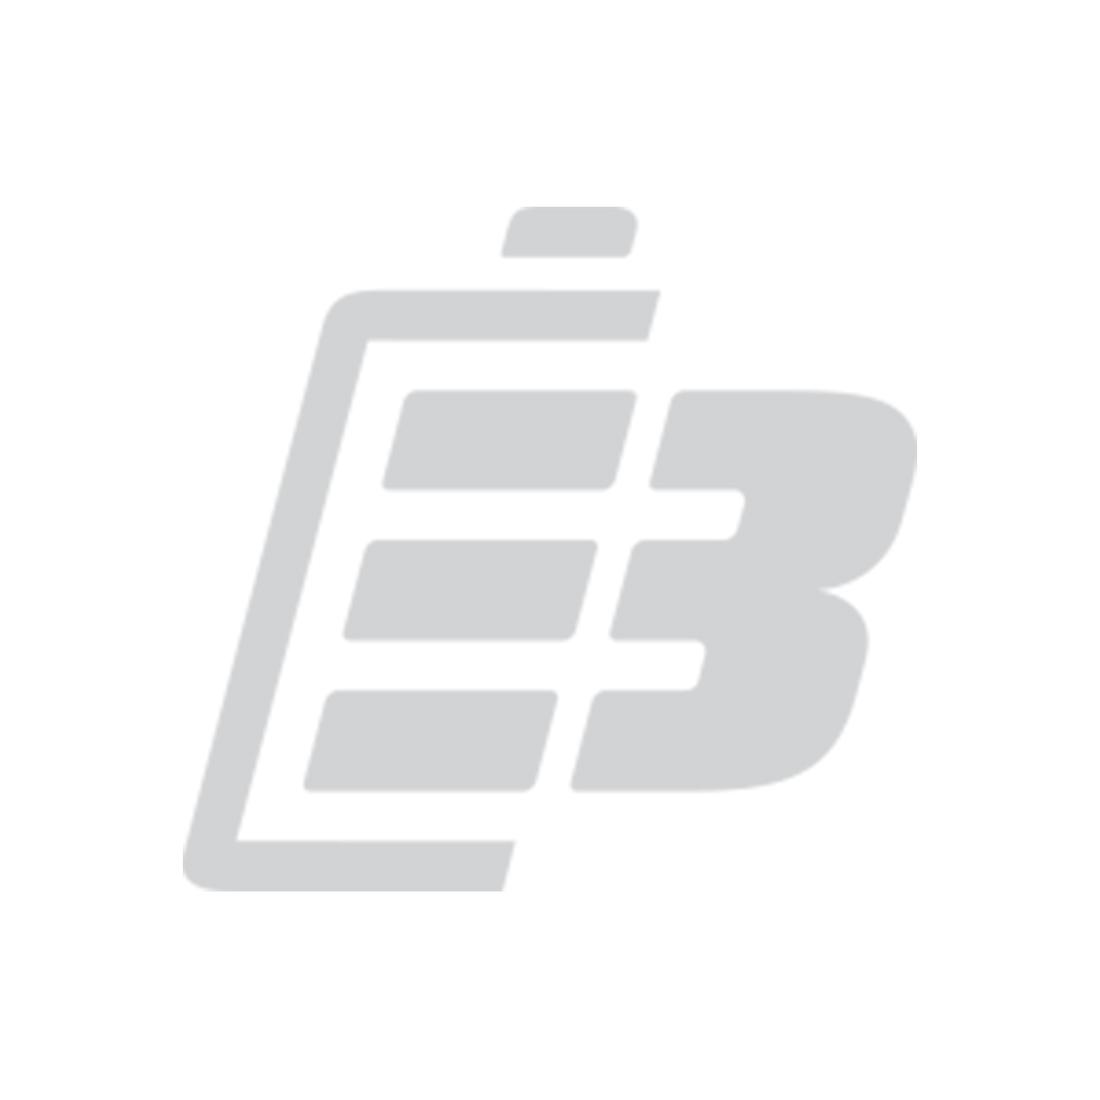 fenix CL30R 650 lumens led camping lantern 1